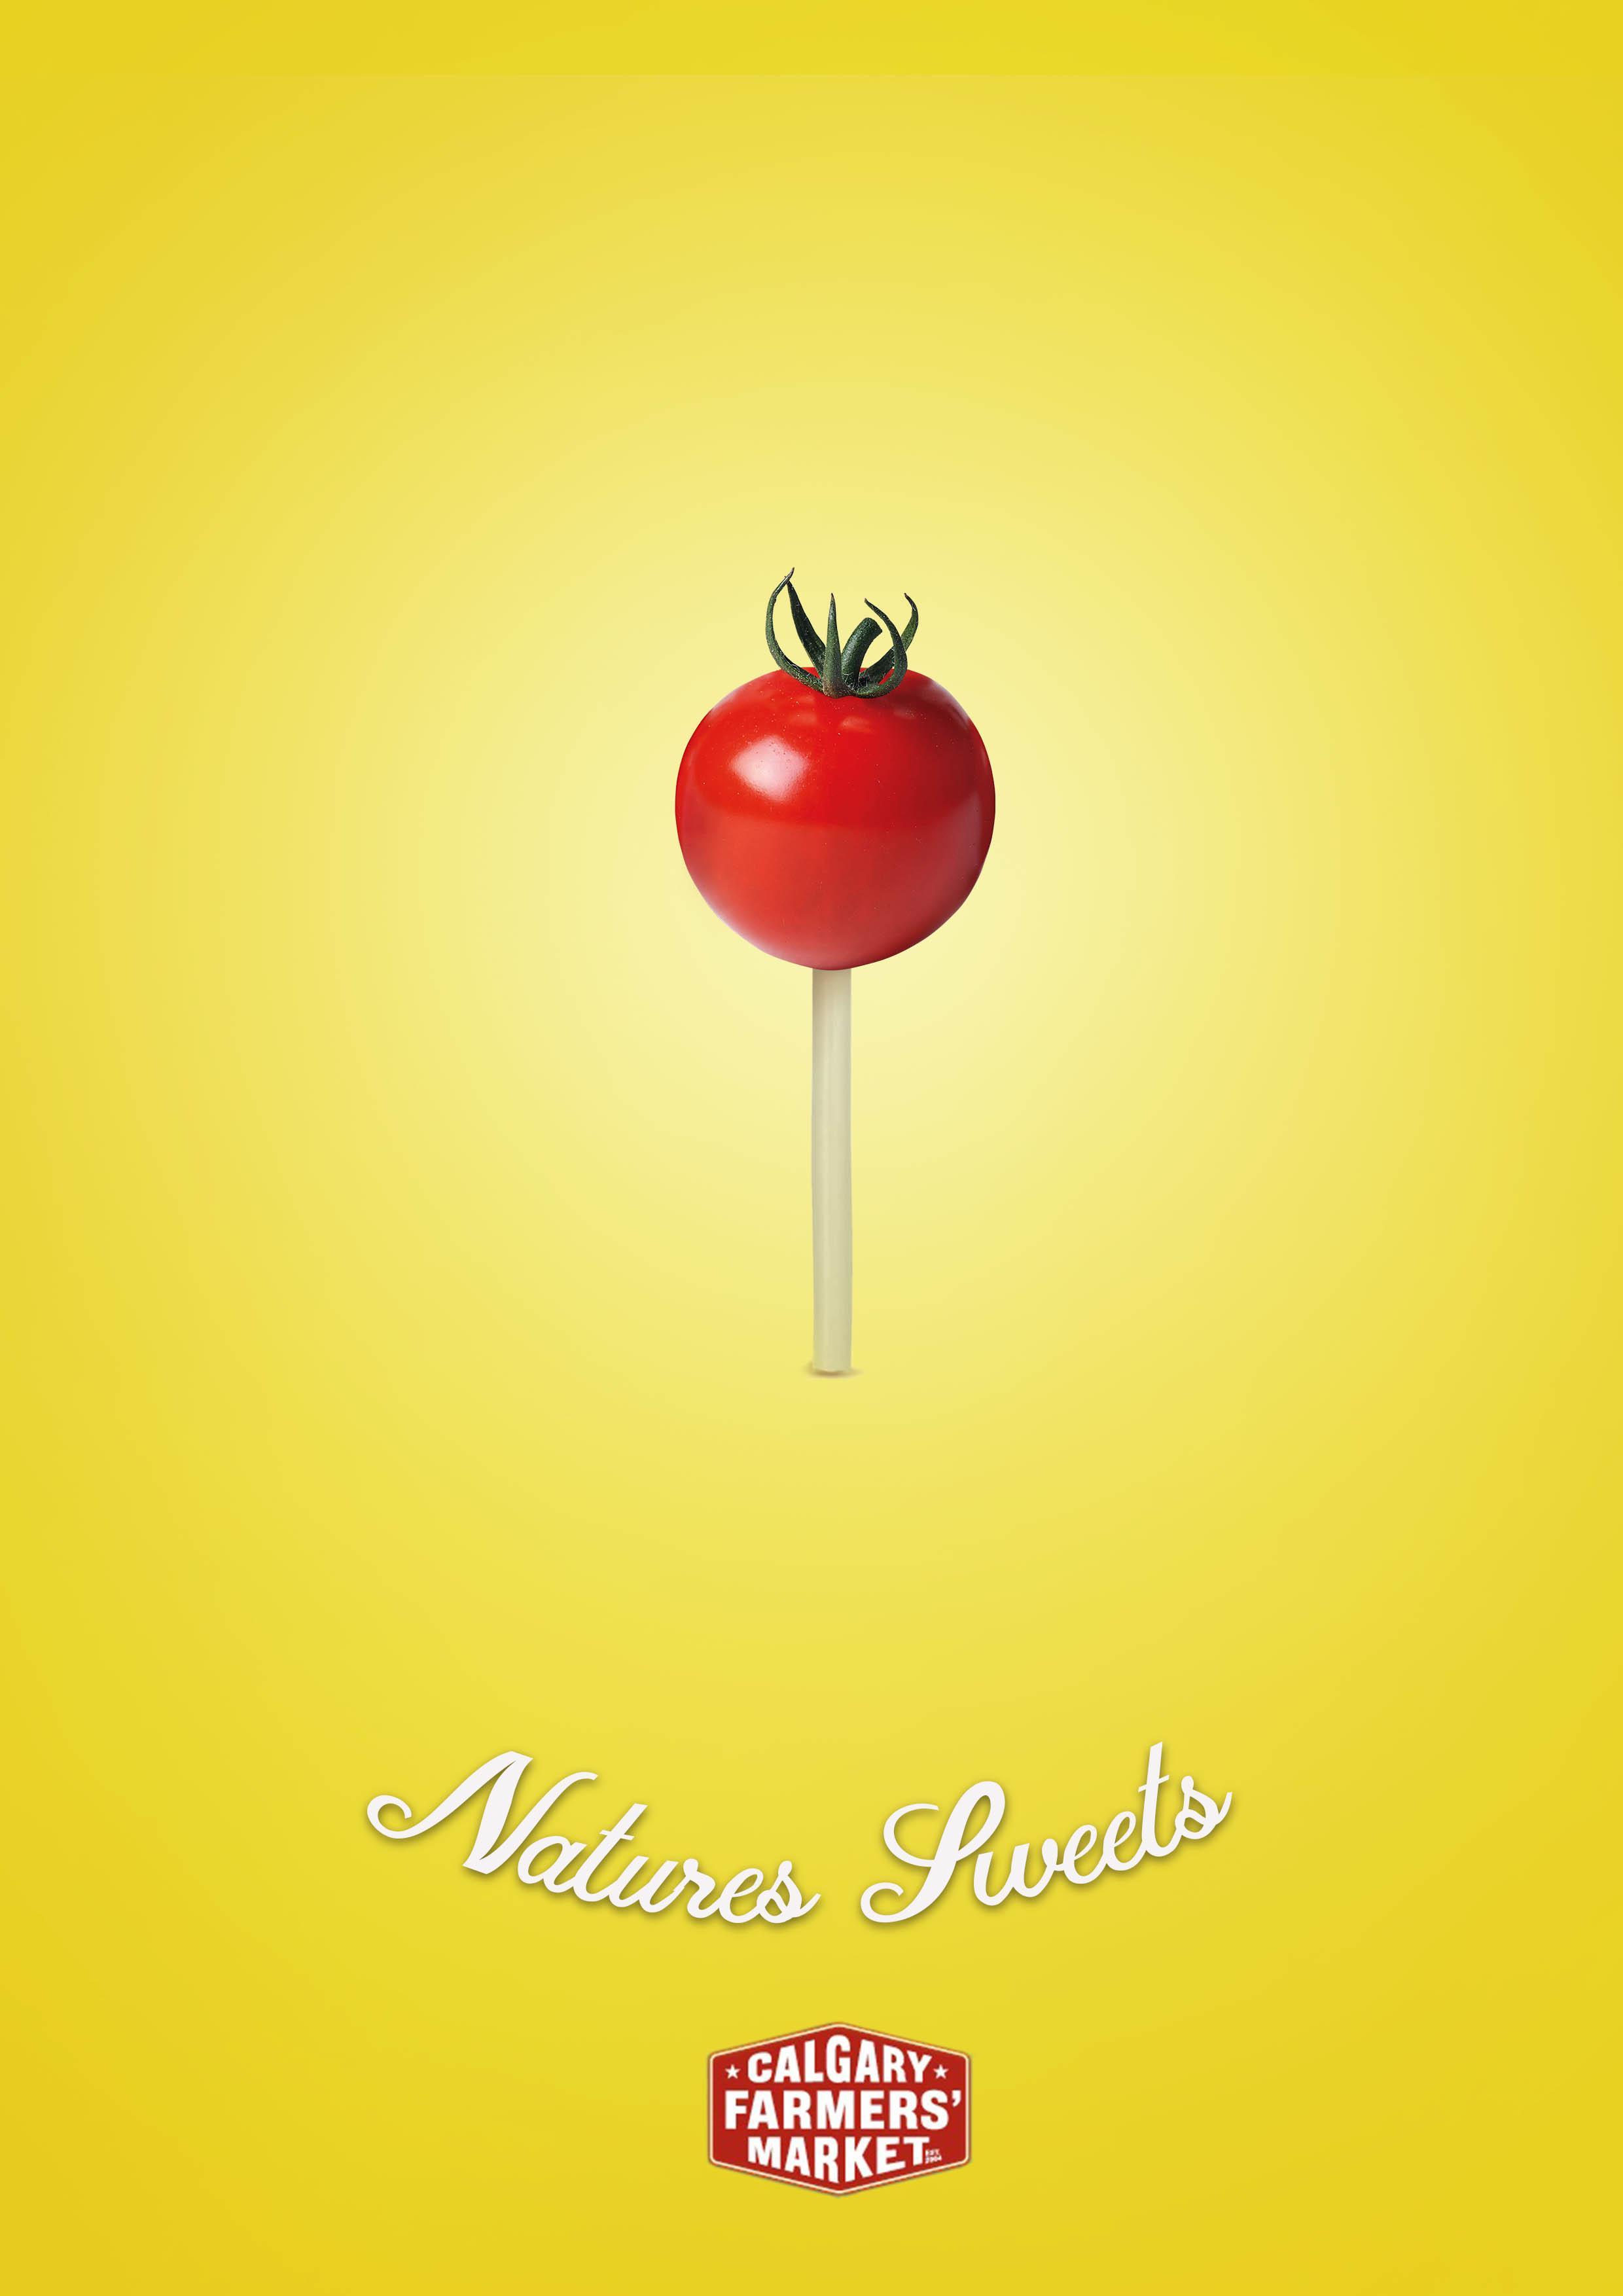 Calgary Farmers' Market Print Ad - Tomato